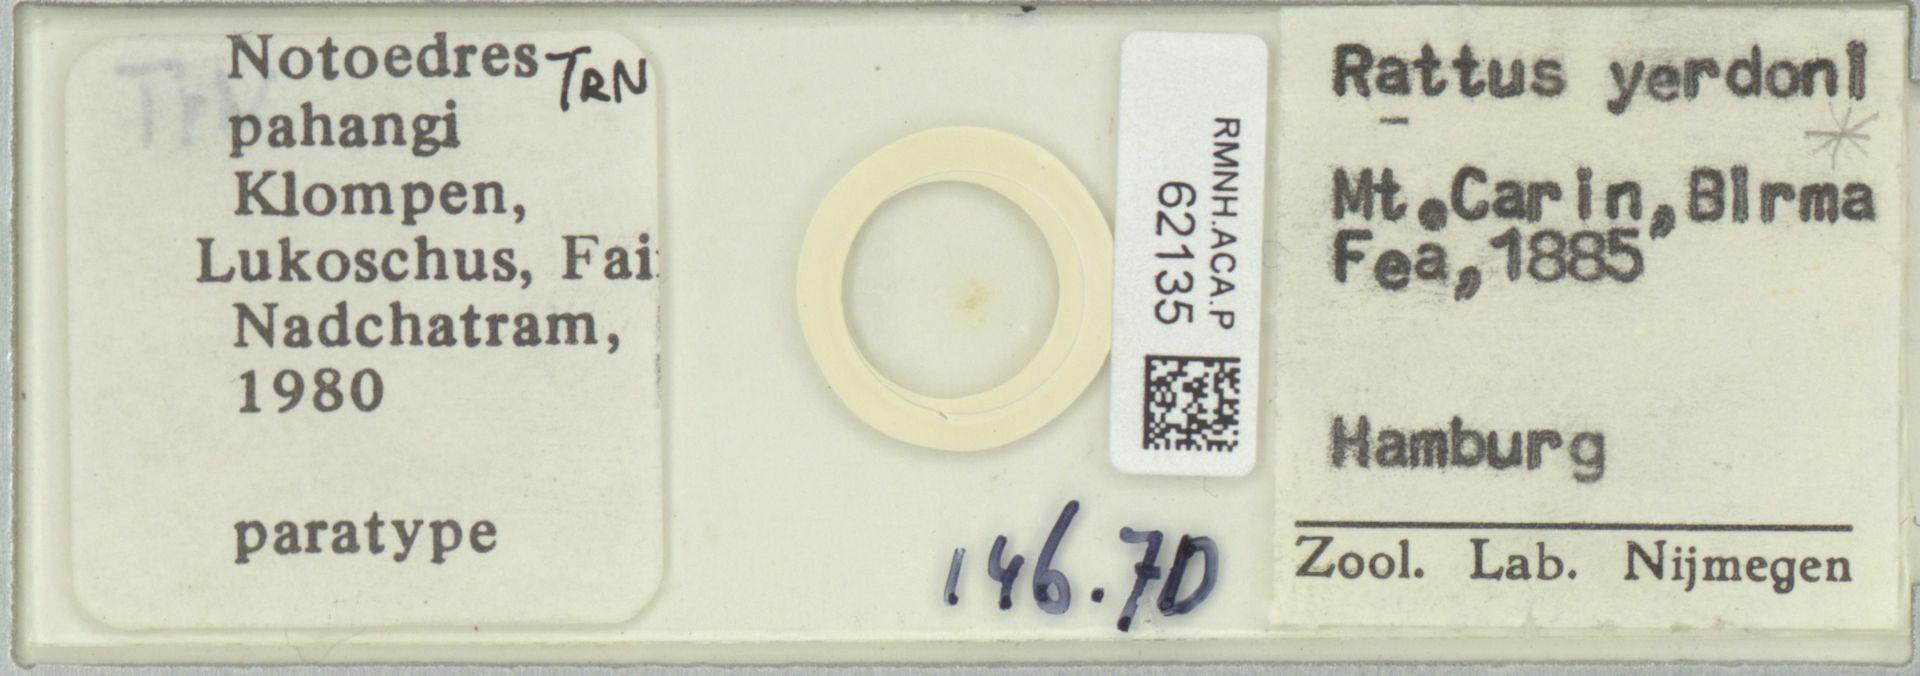 RMNH.ACA.P.62135 | Notoedres pahangi Klompen, Lukoschus, Fain & Nadchatram, 1980